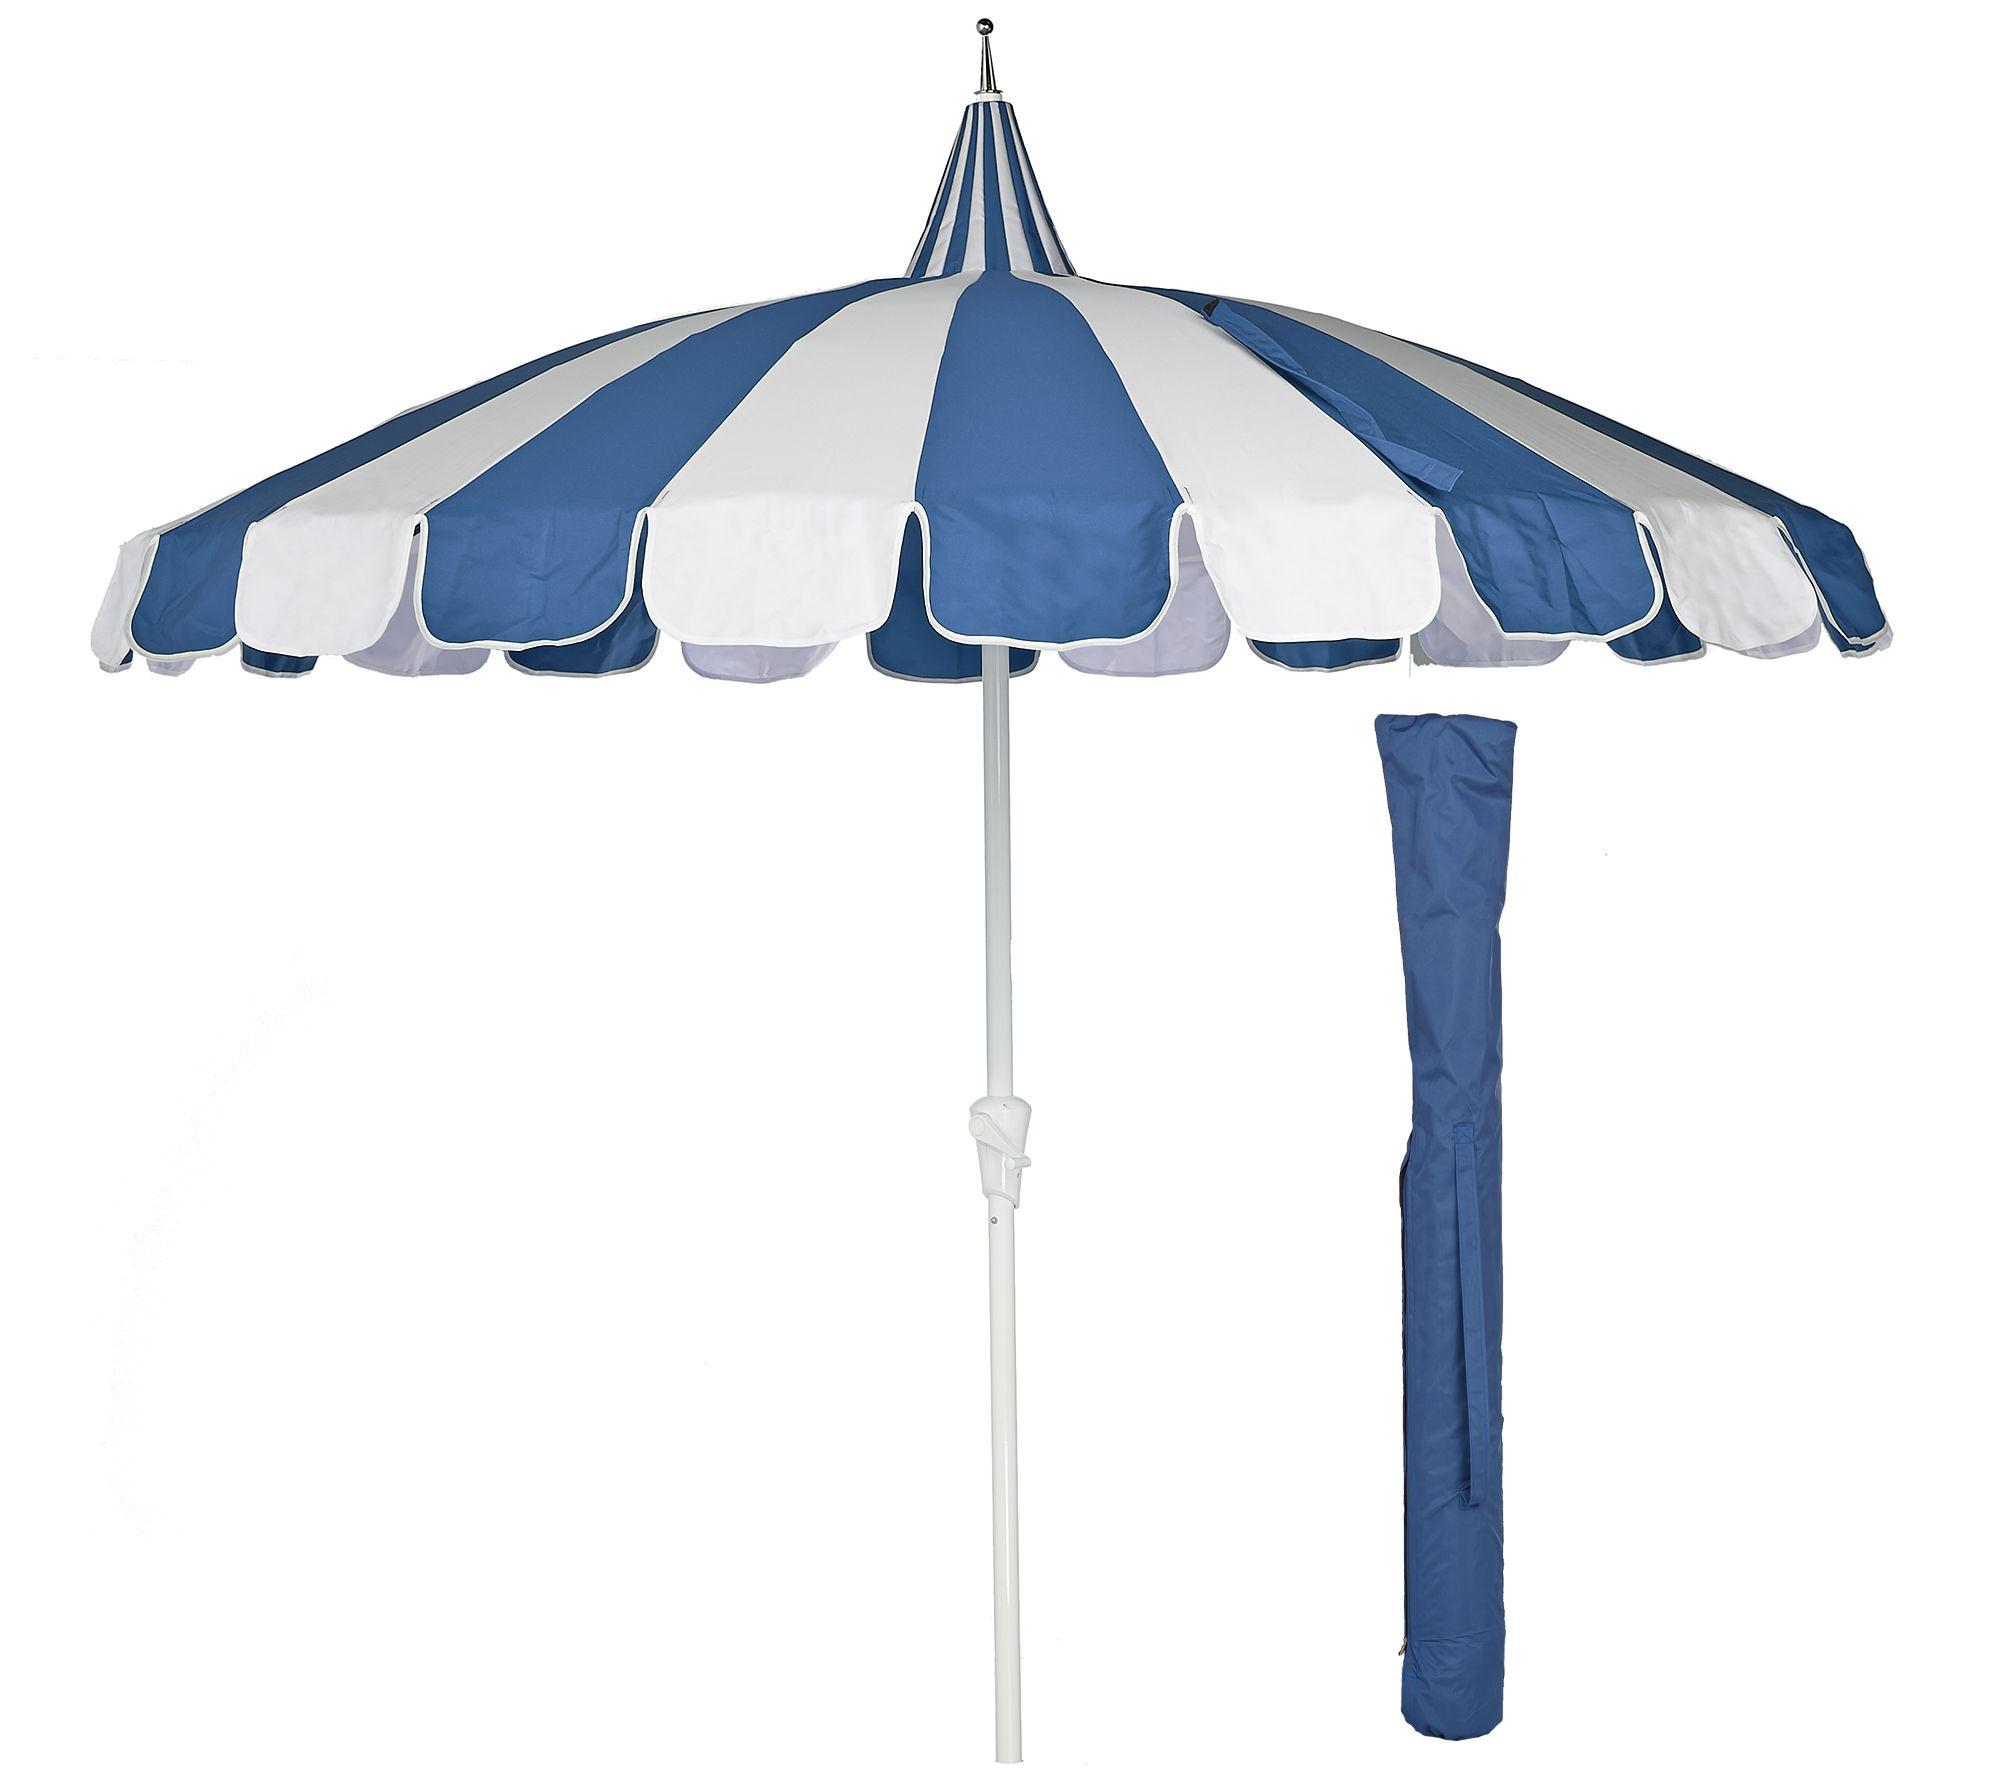 ED On Air 8u0027 Pagoda Umbrella W/ Cover By Ellen DeGeneres   Page 1 U2014 QVC.com